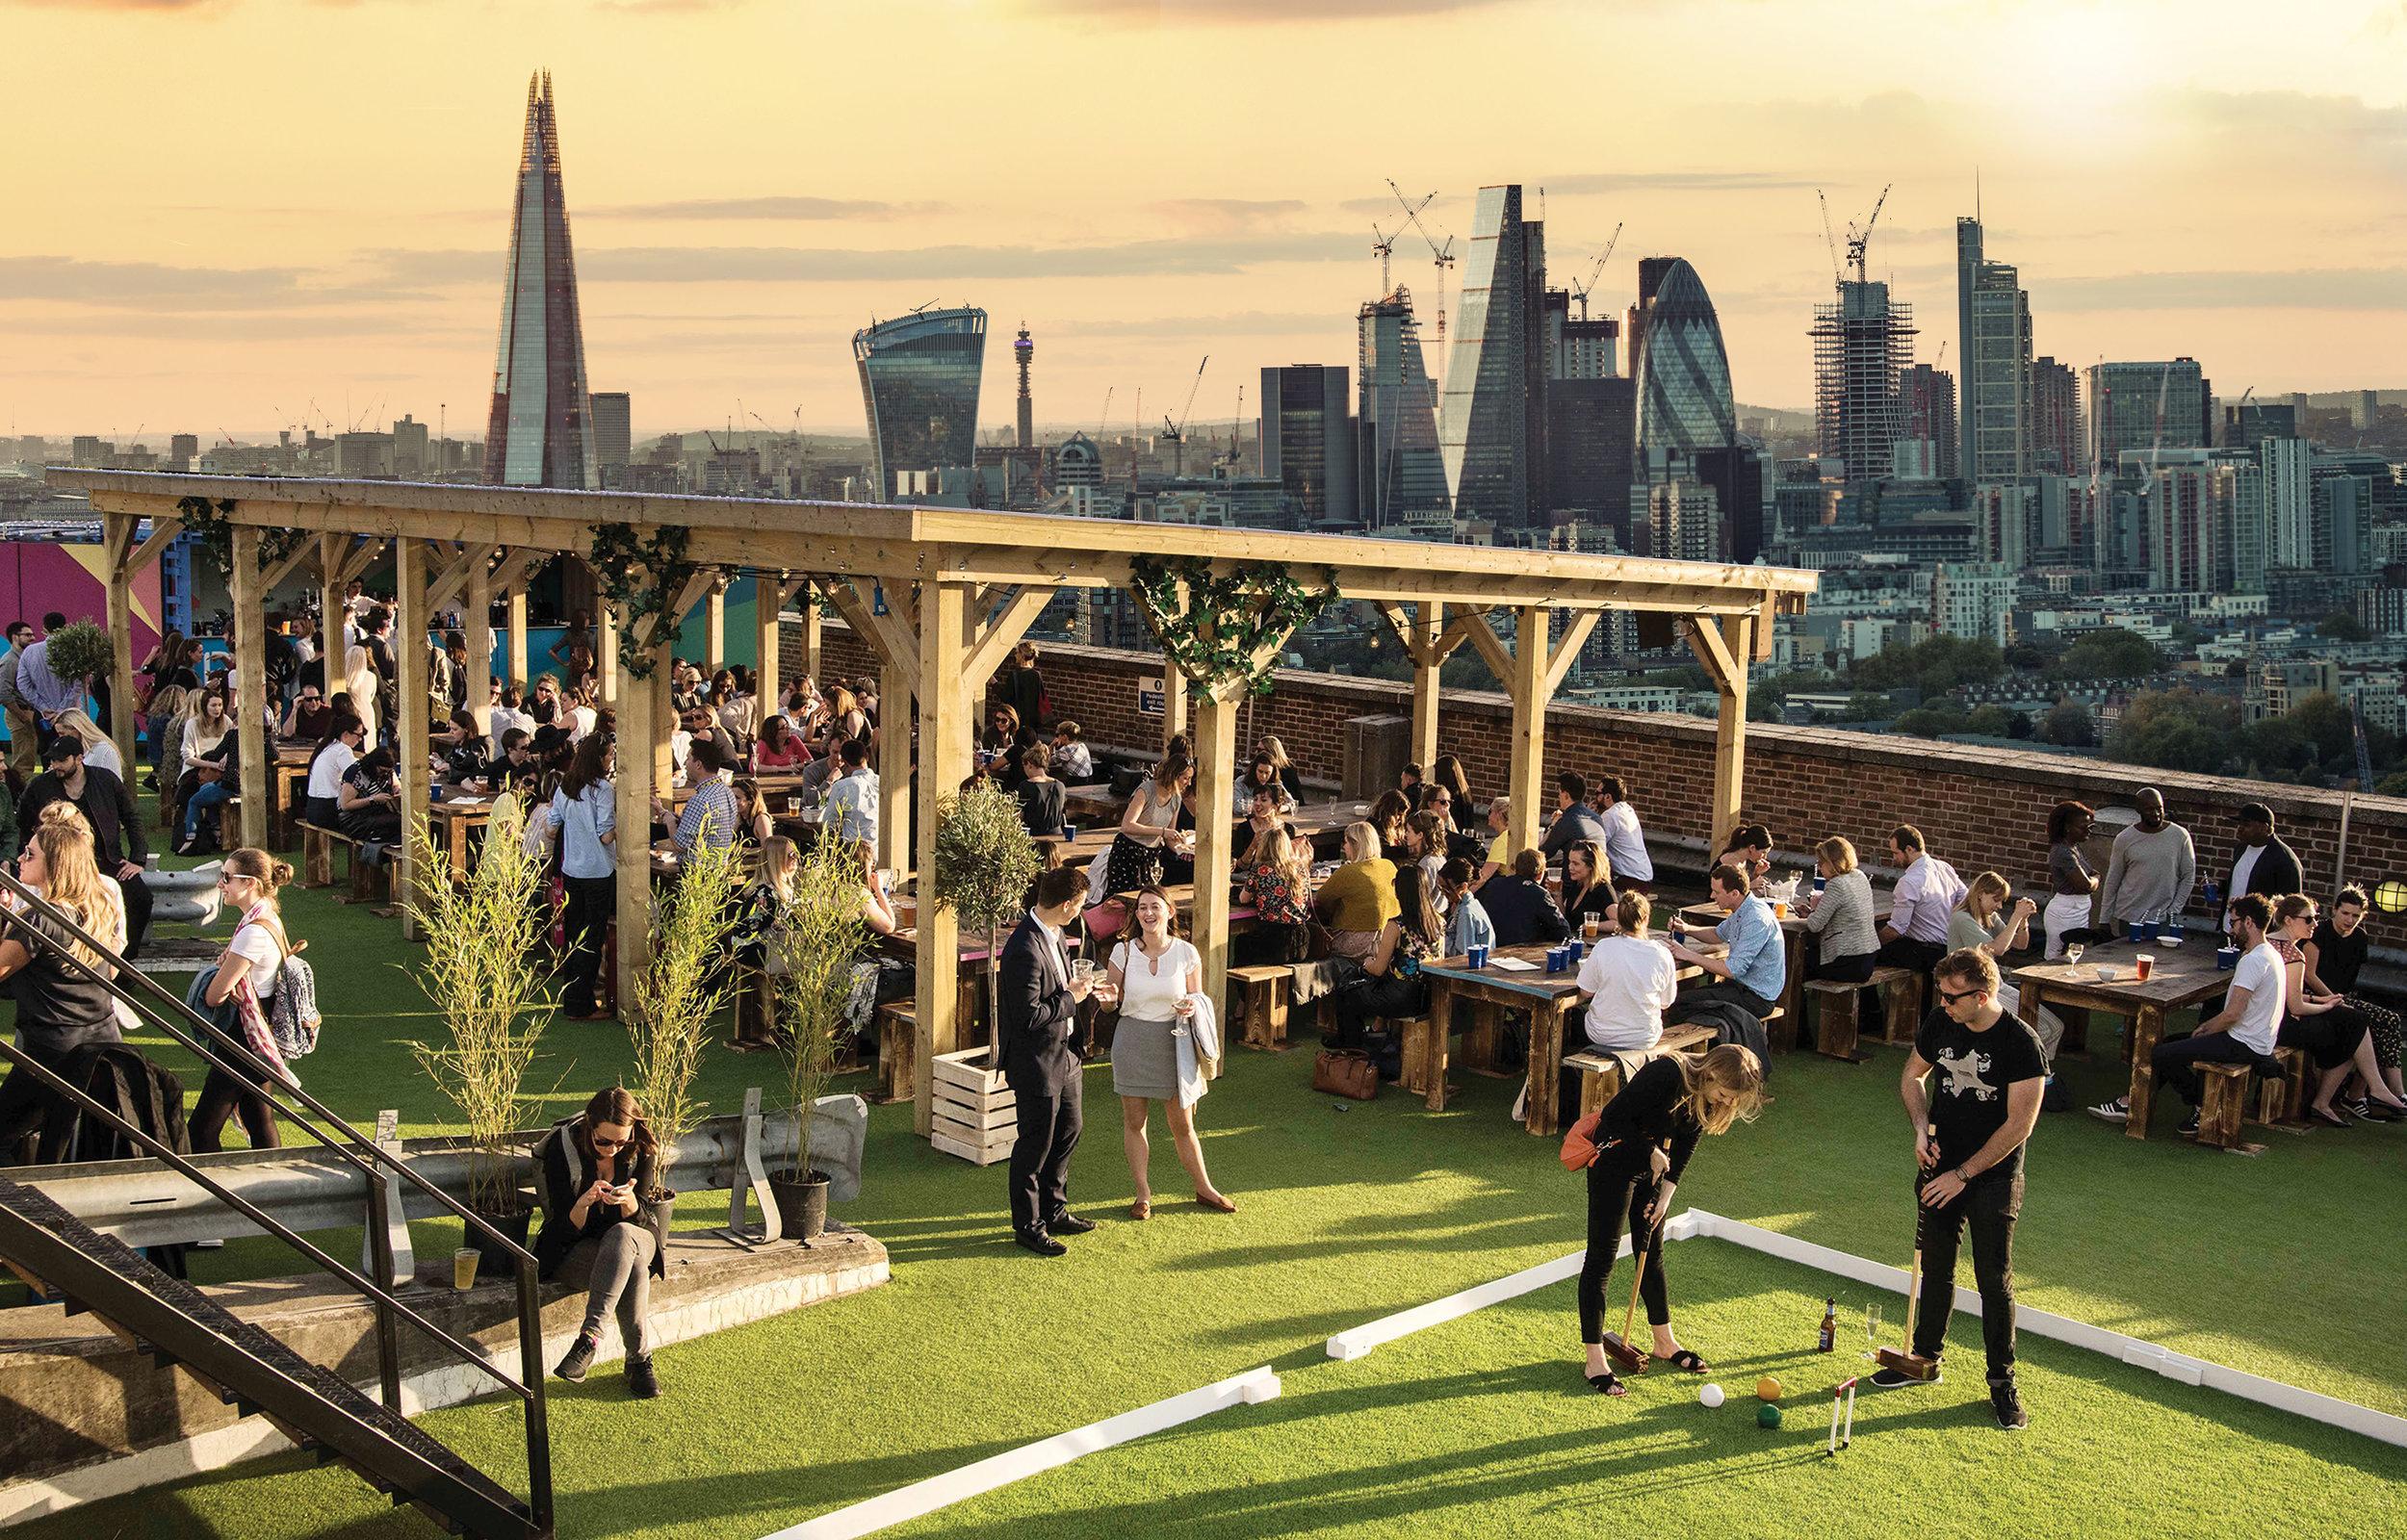 Skylight London – Rooftop bar at Tobacco Dock